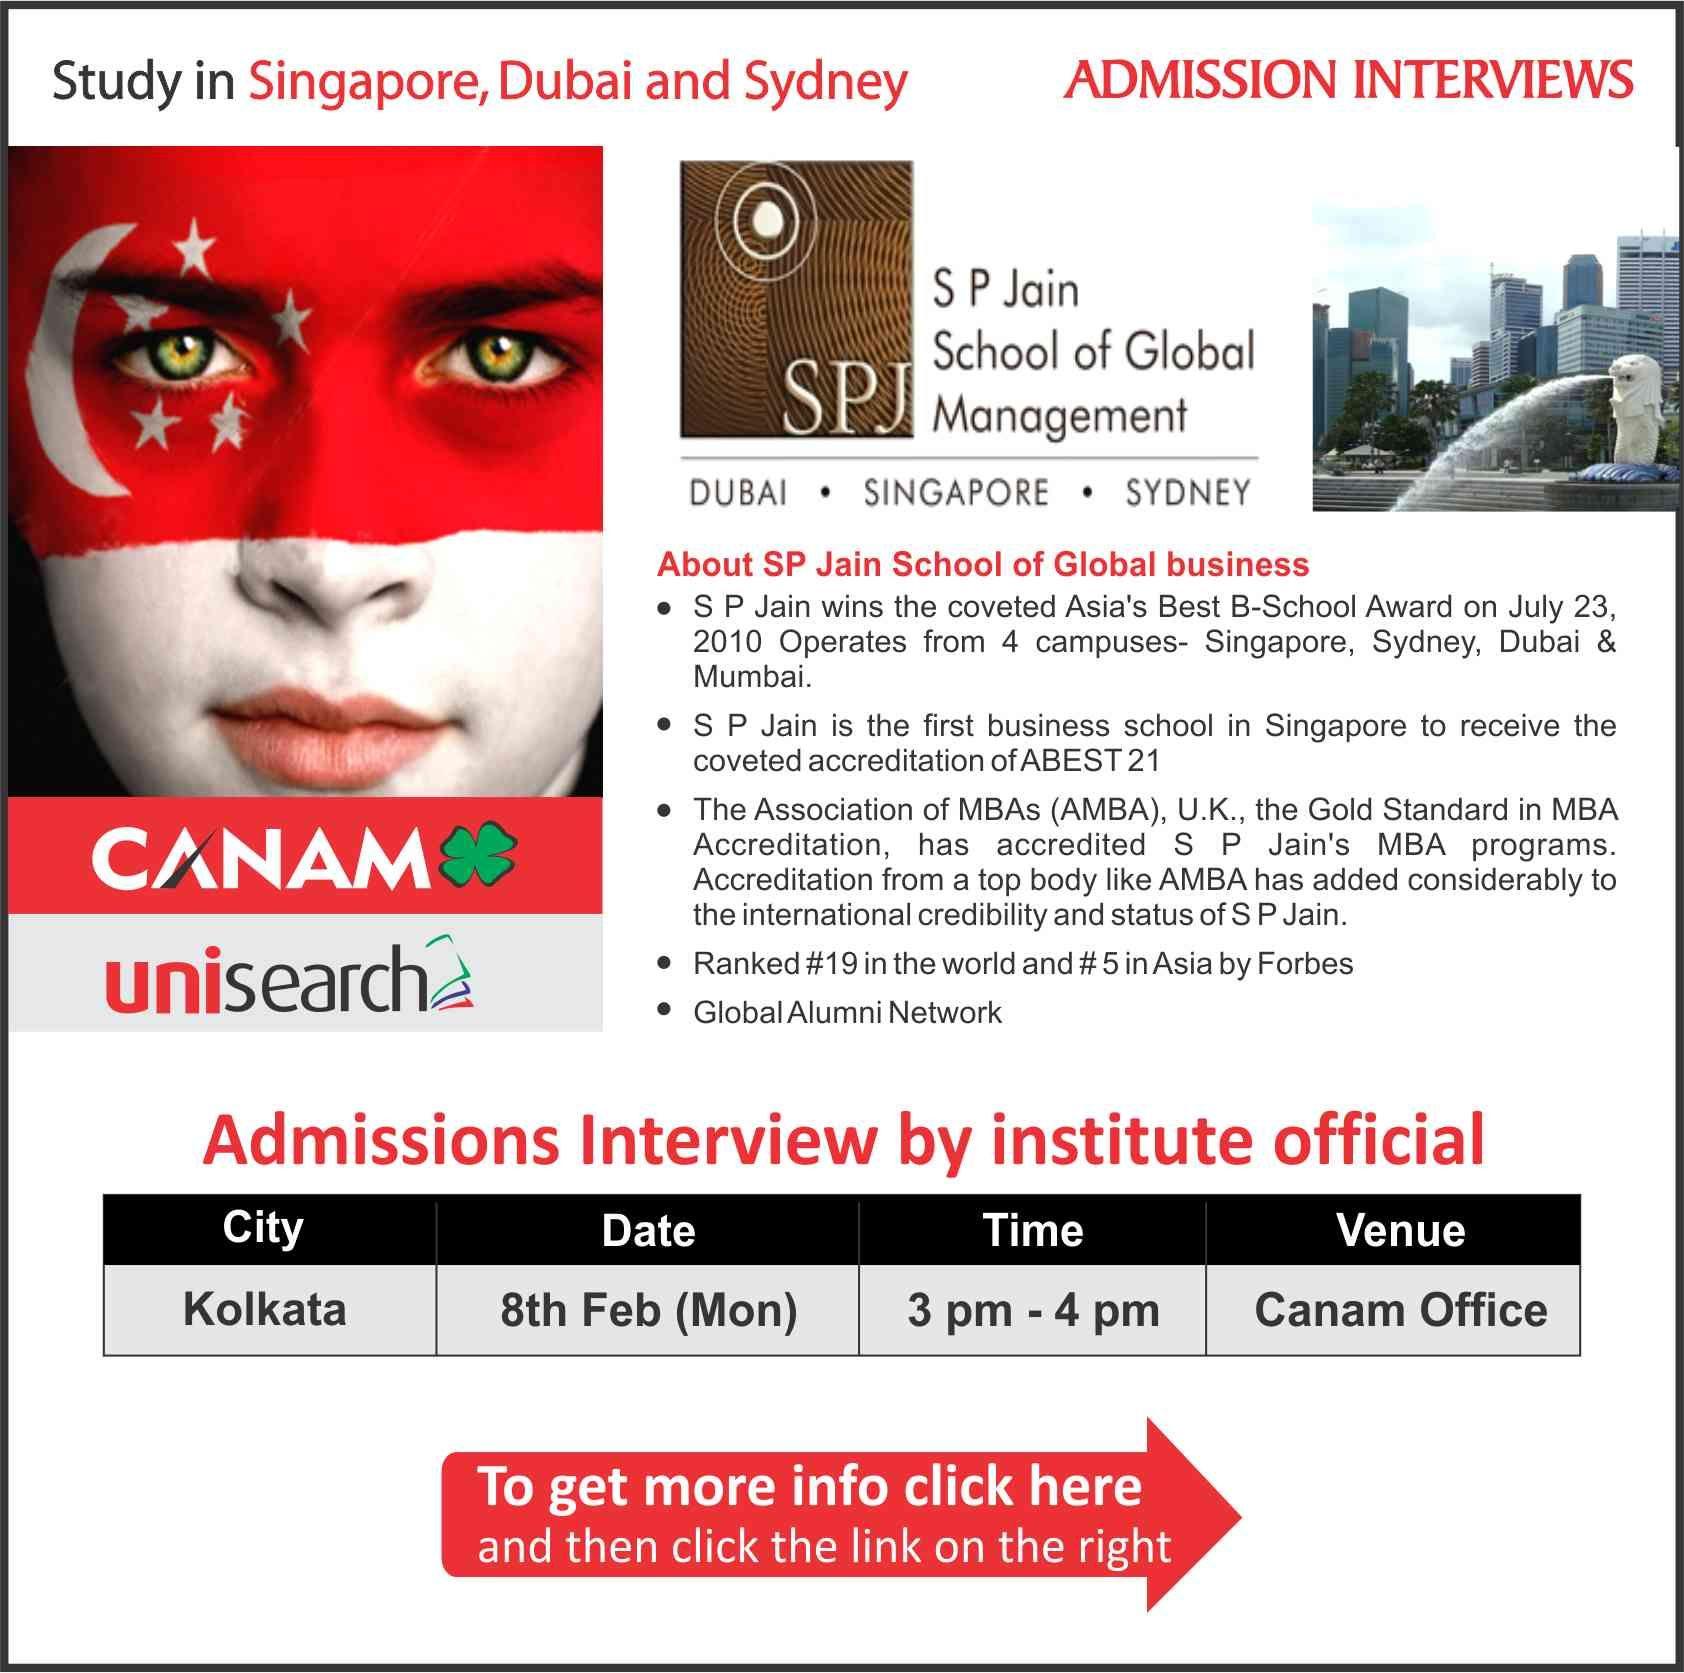 Study in Singapore, Dubai & Sydney S P Jain School of